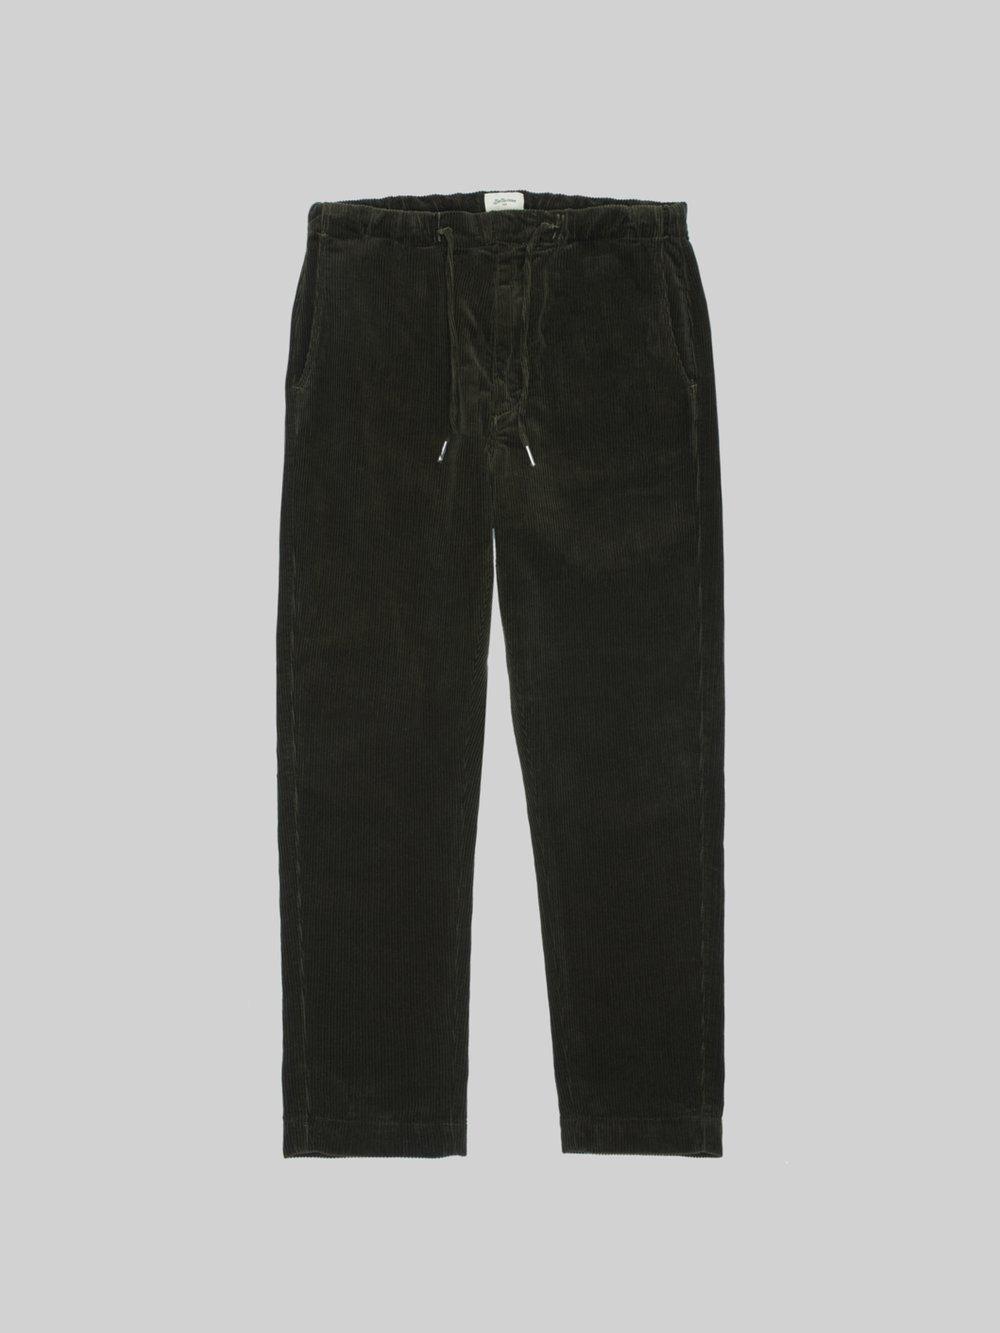 Pogg pants